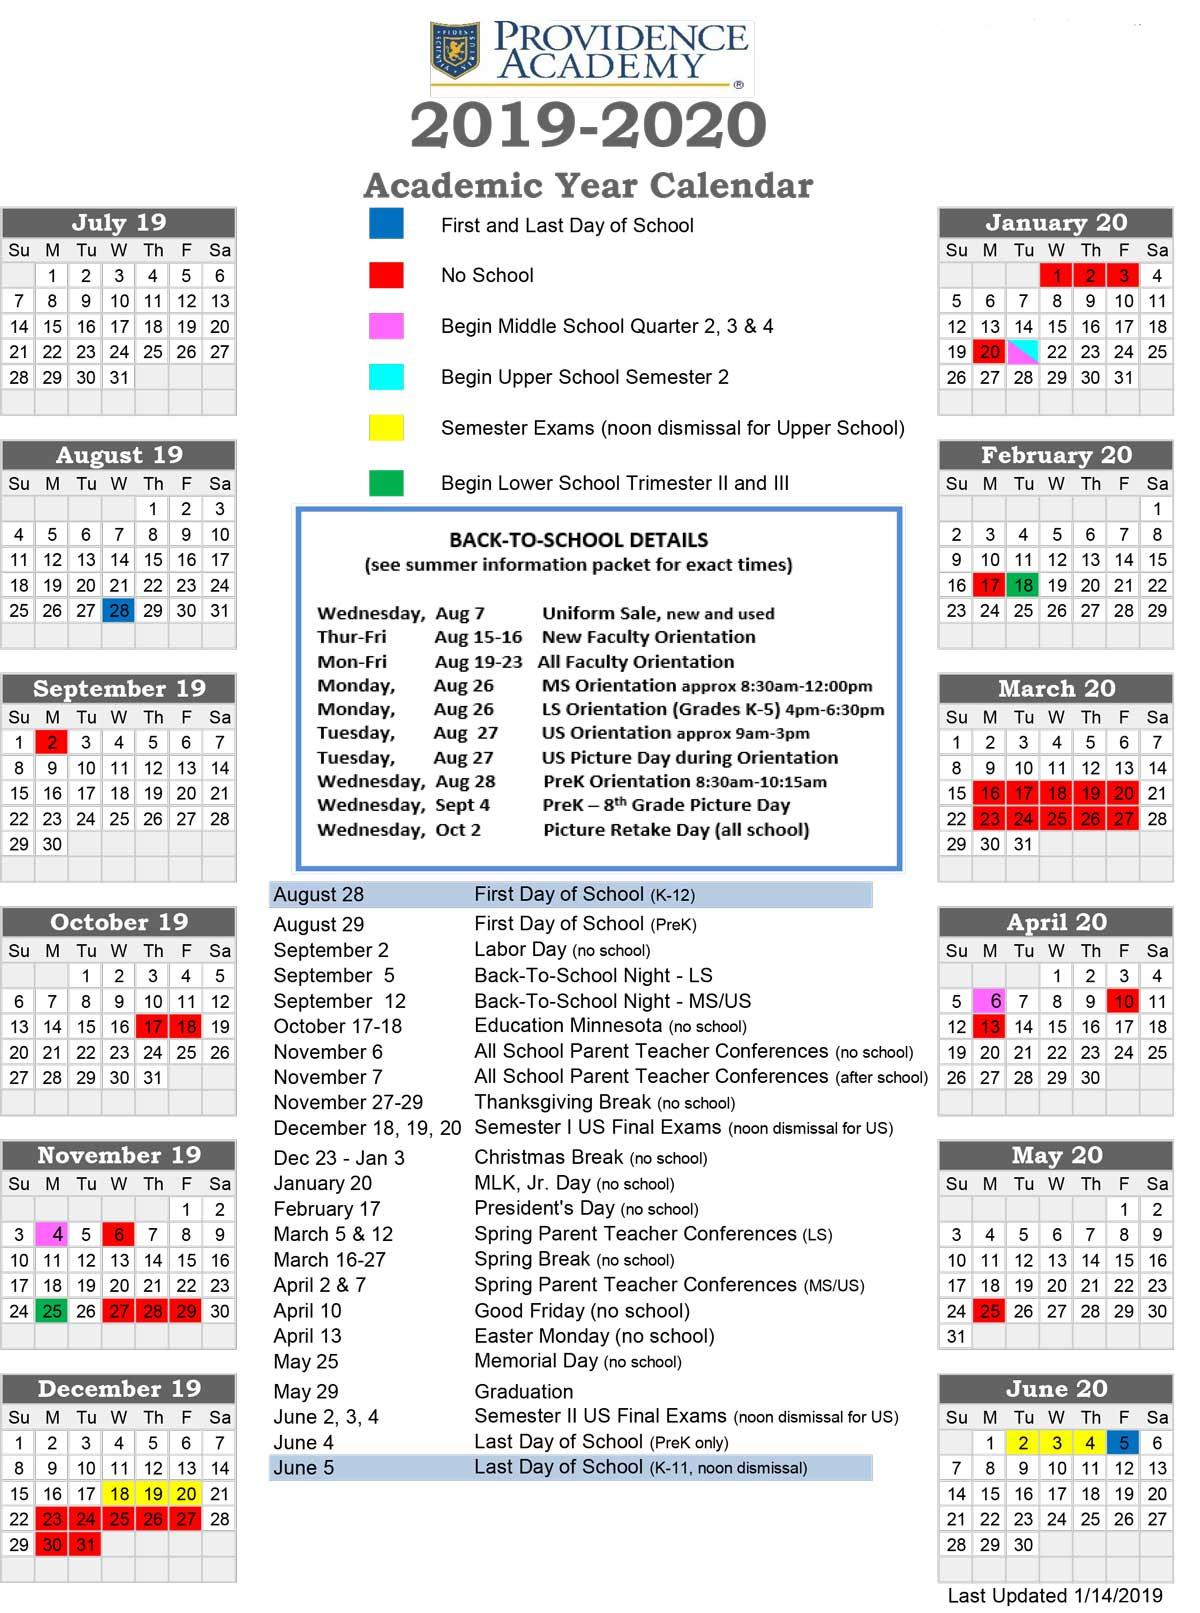 Academic Calendar - Providence Academy In University Of Minnesota2020 2021 Academic Calendar